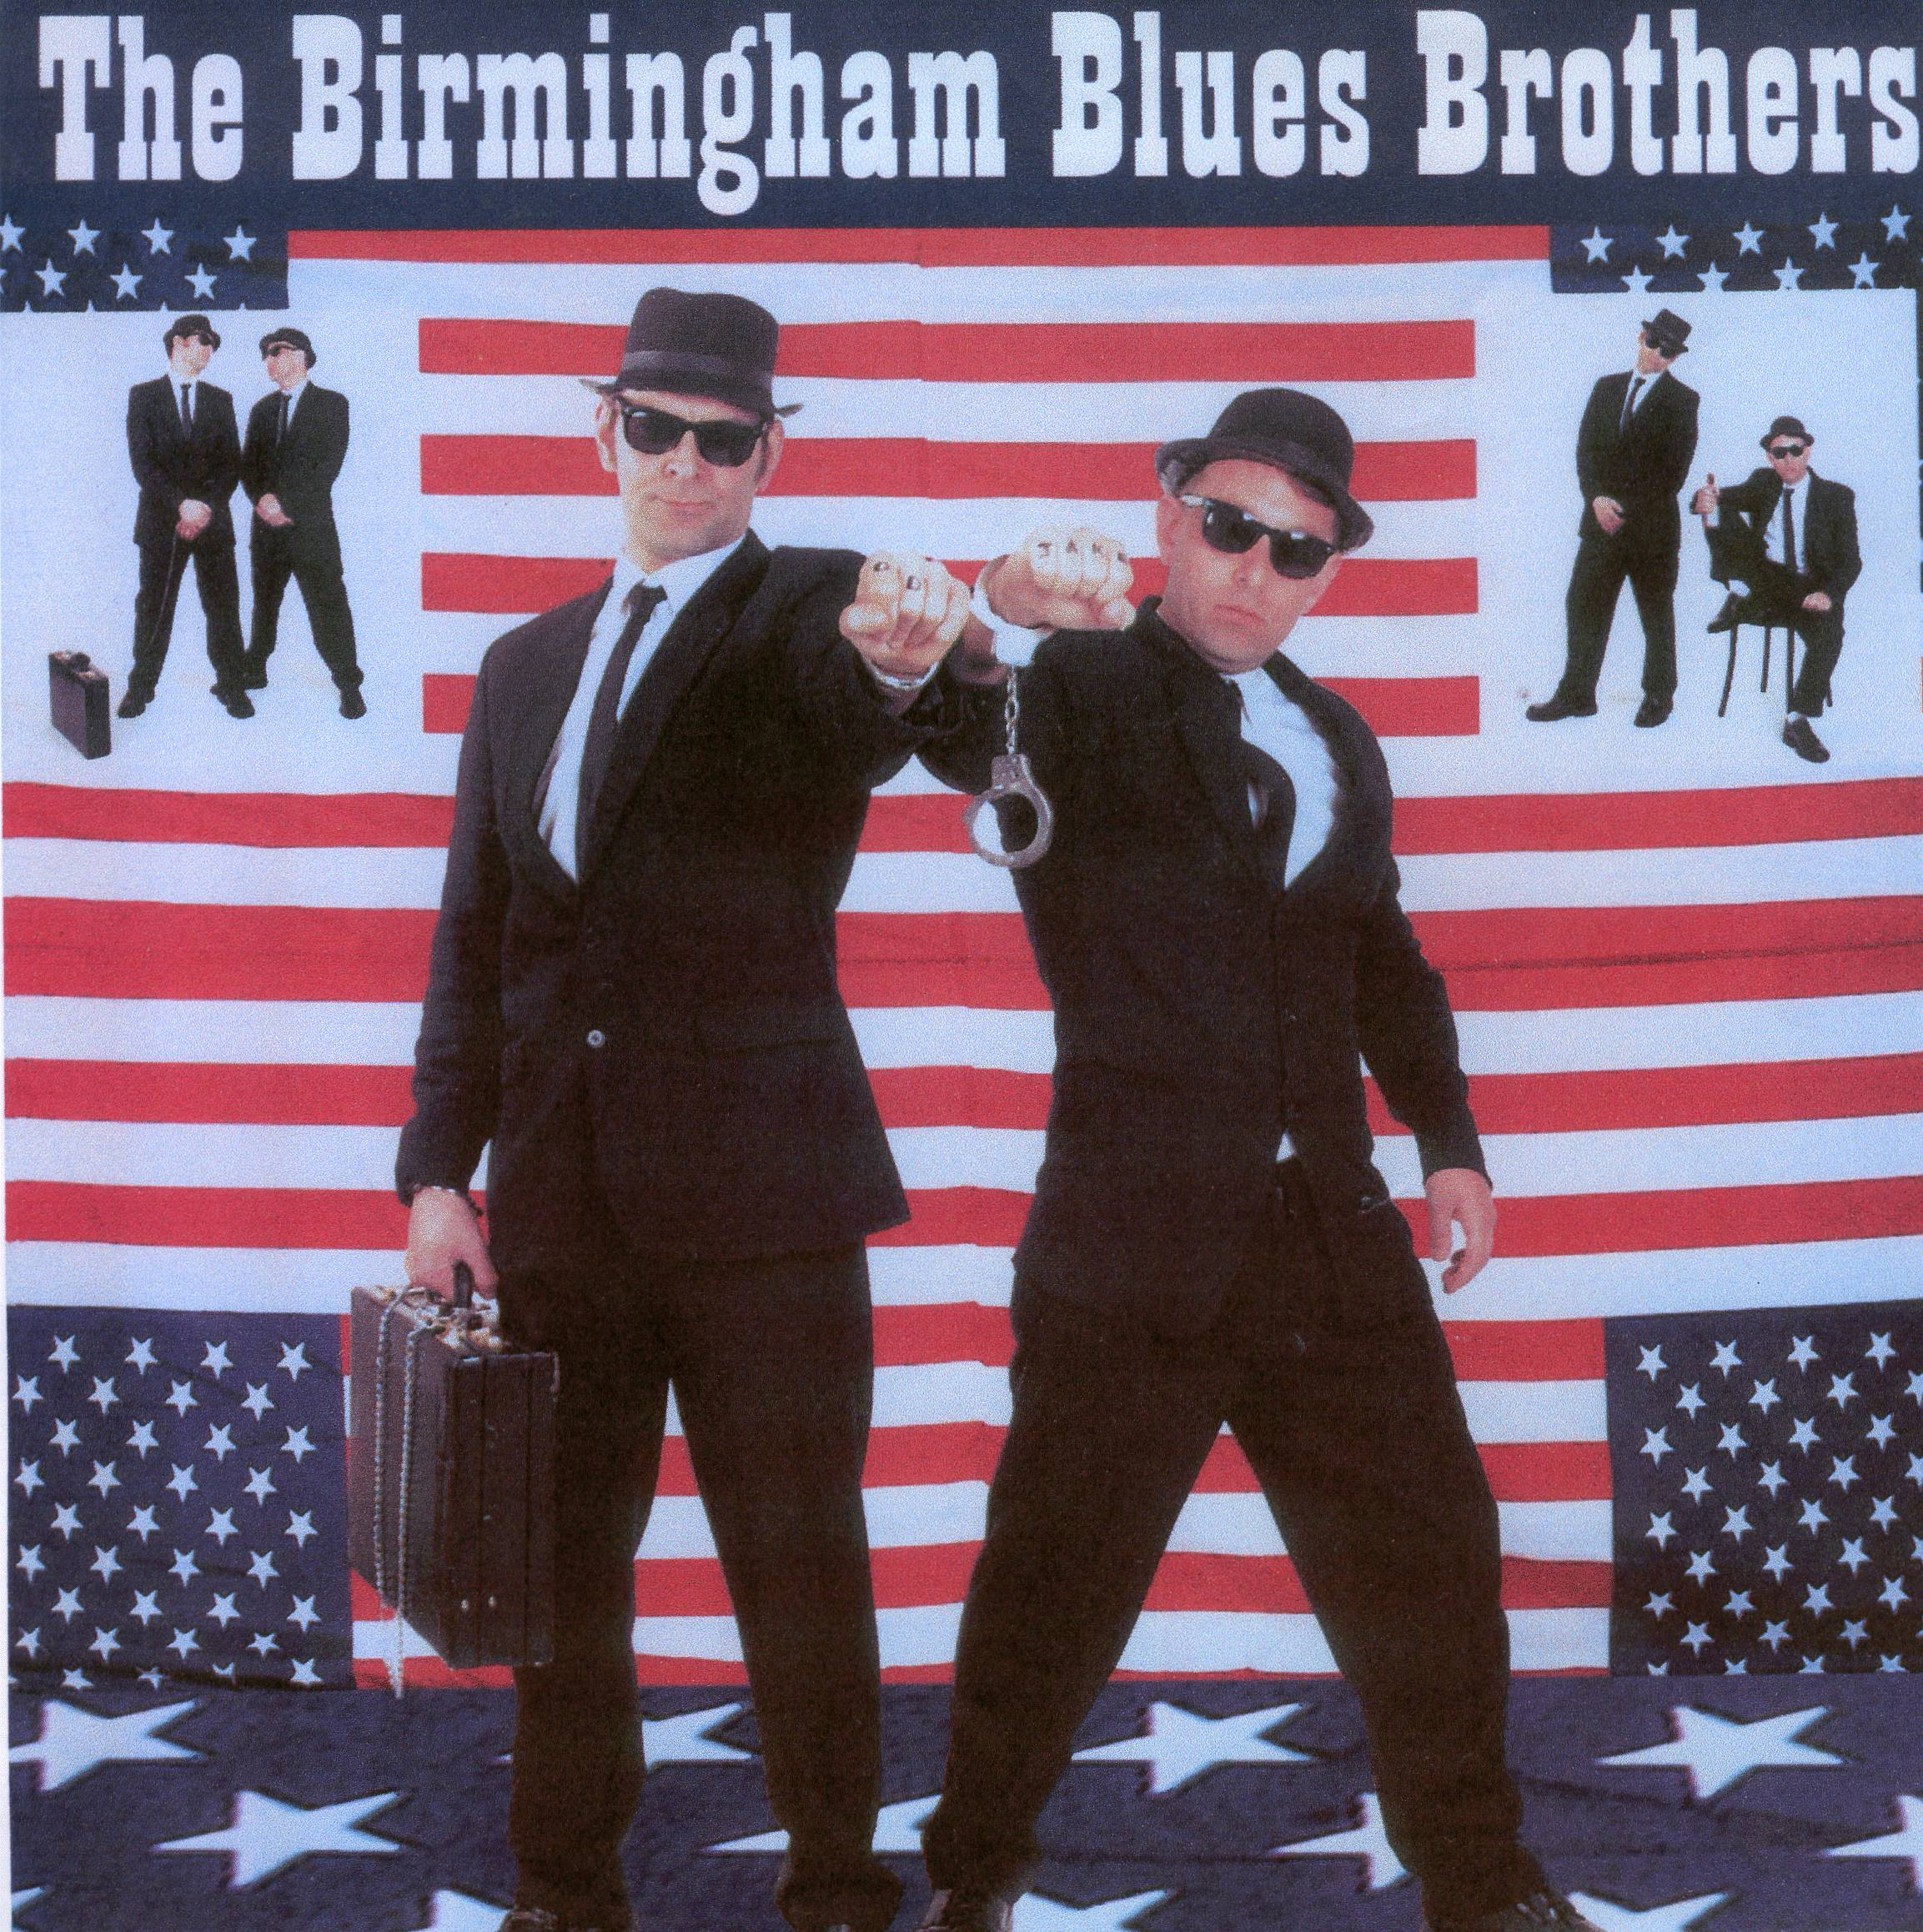 BIRMINGHAM BLUES BROTHER.